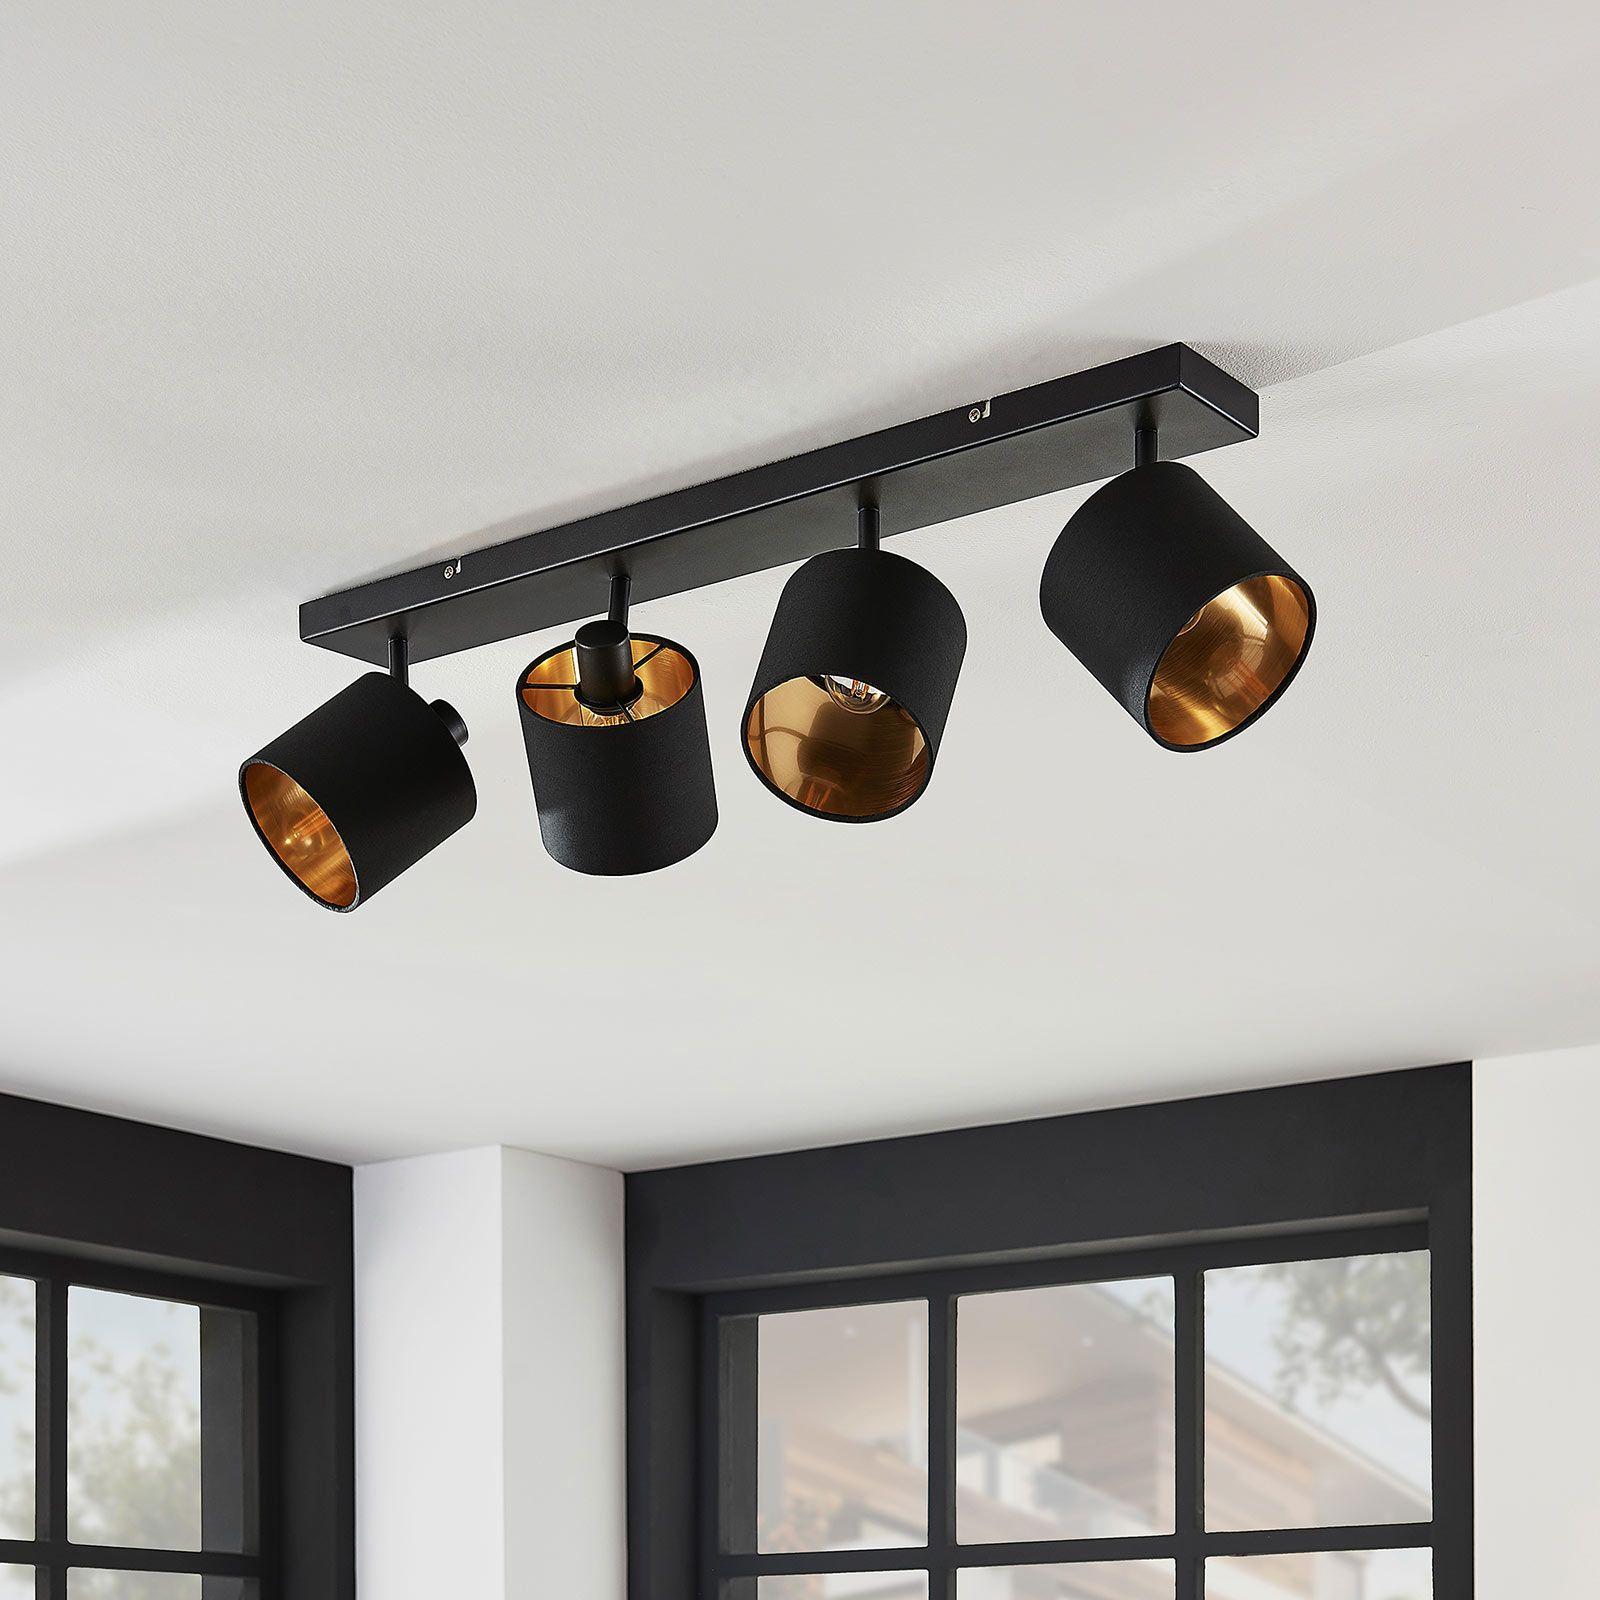 Stoffen plafondlamp Vasilia zwart-goud, 4-lamps van Lindby